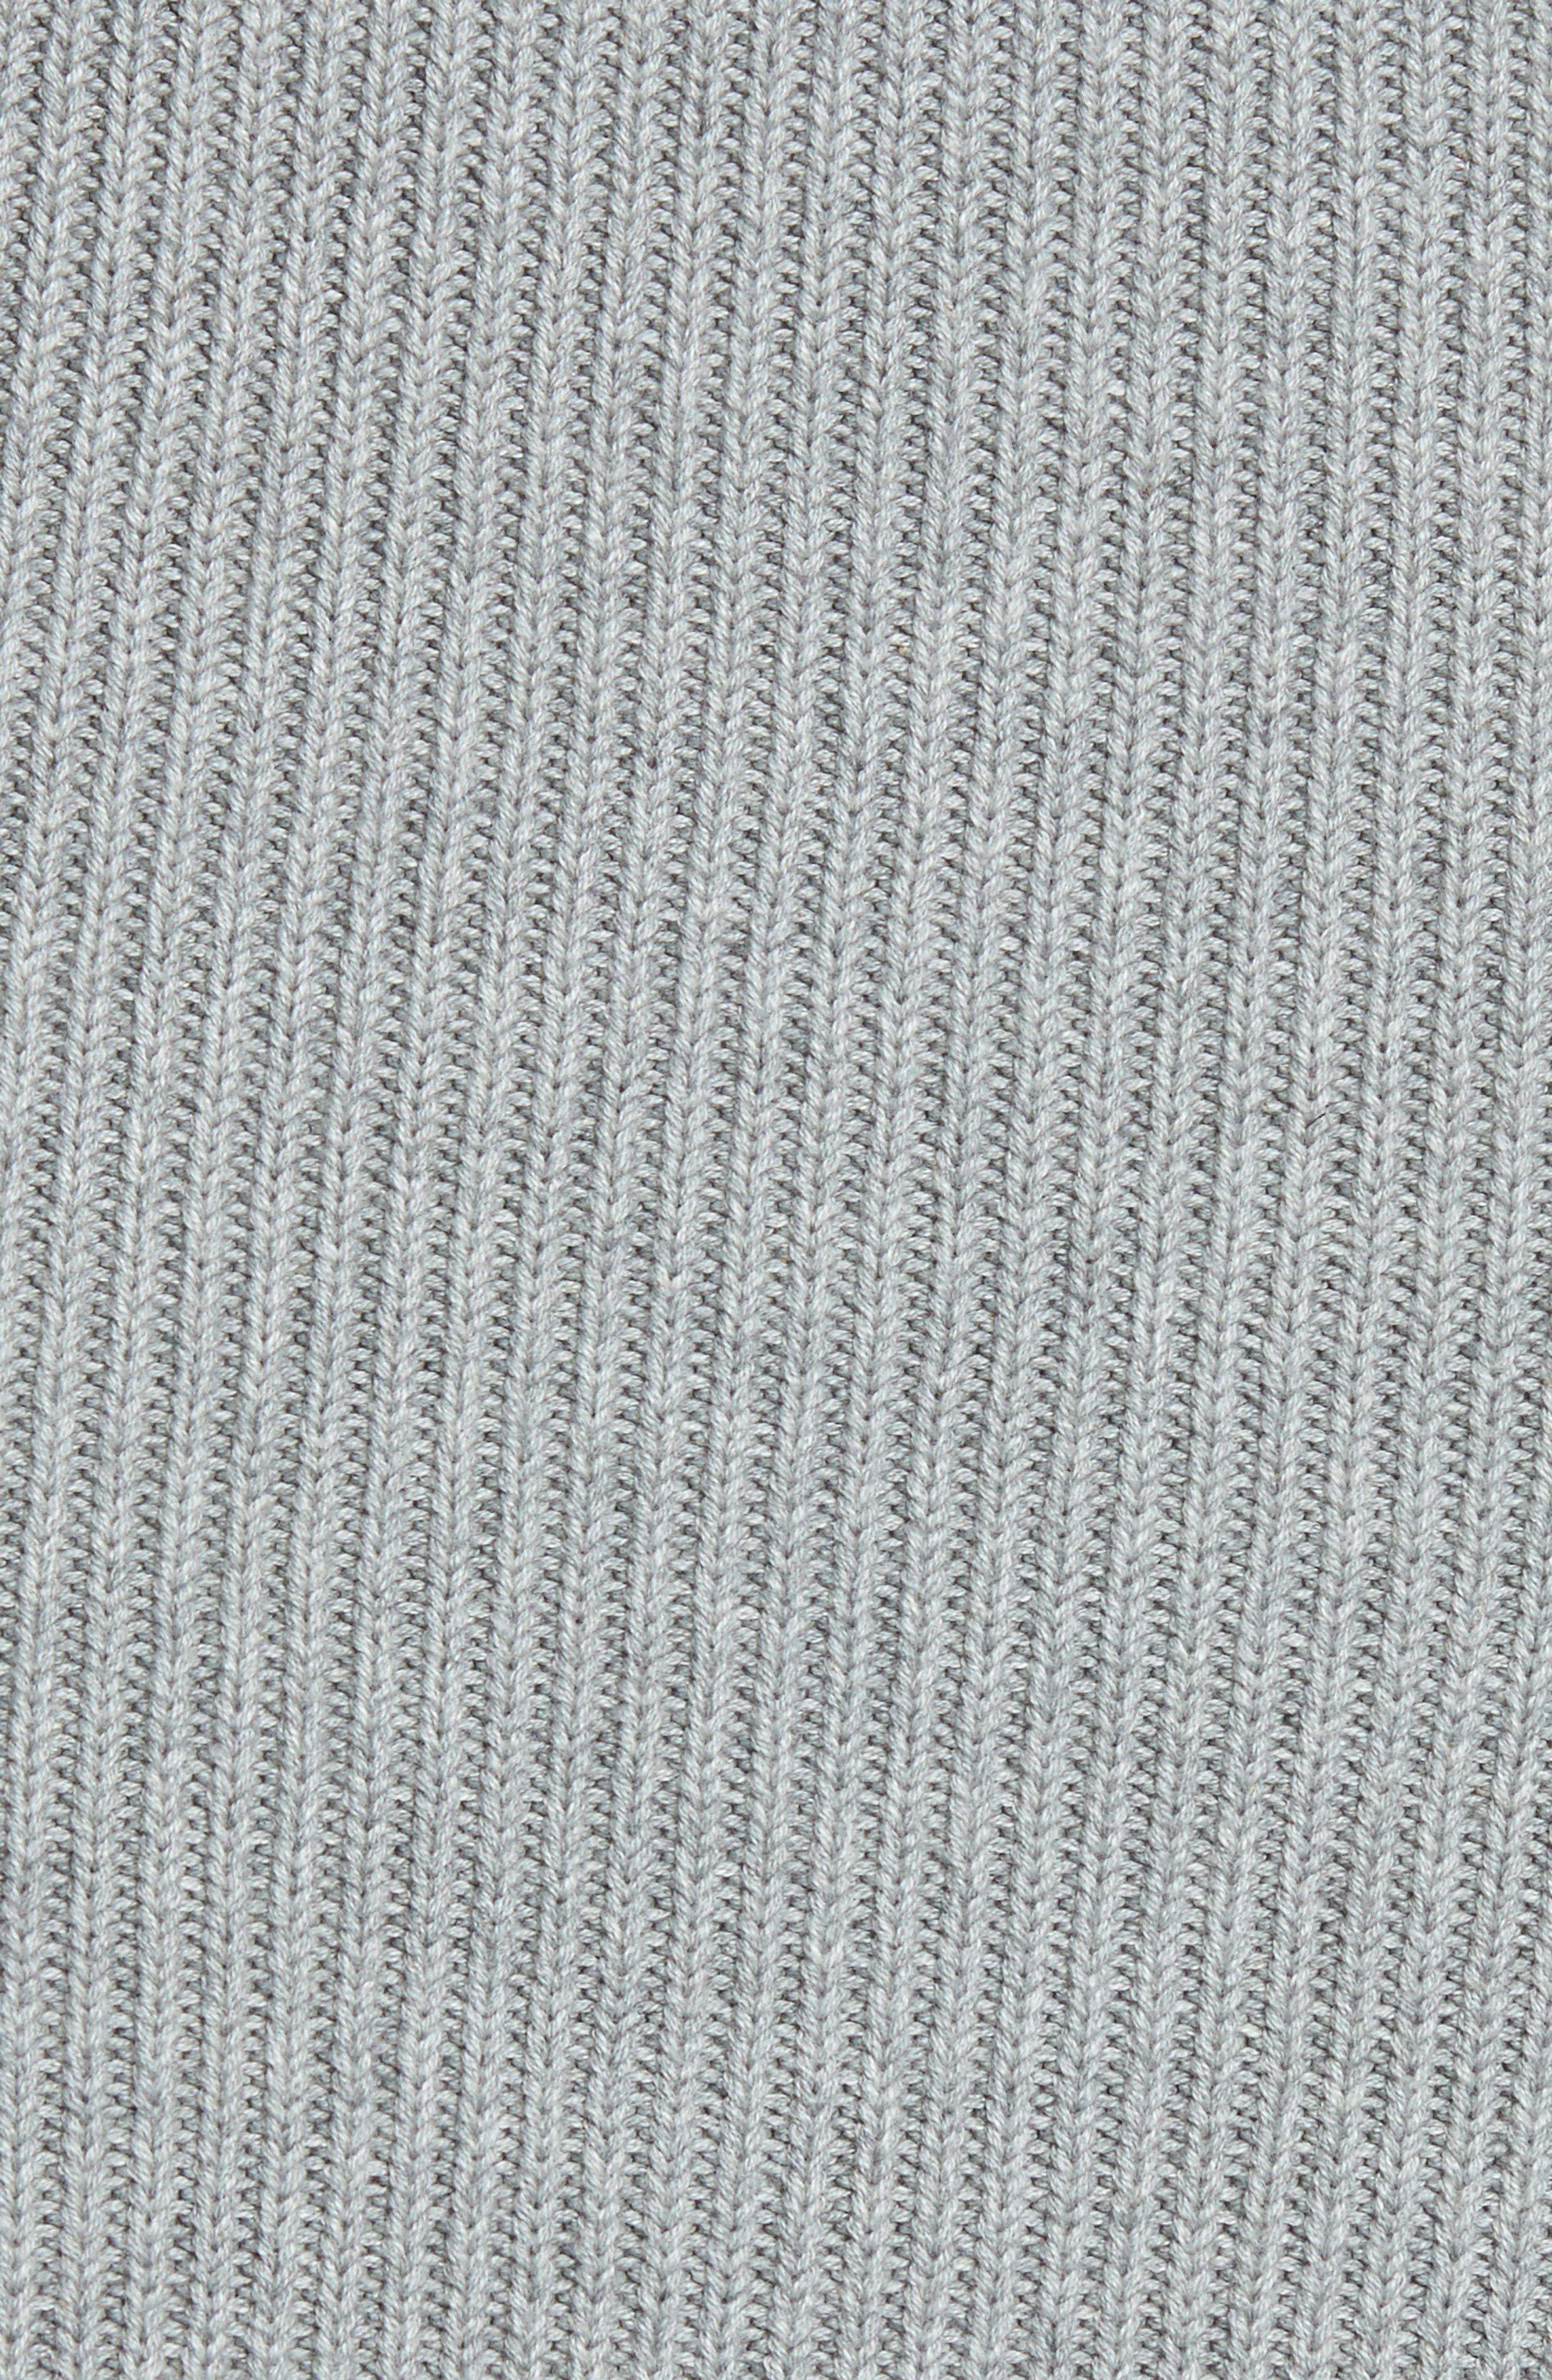 Galactic Knit Skirt,                             Alternate thumbnail 5, color,                             051